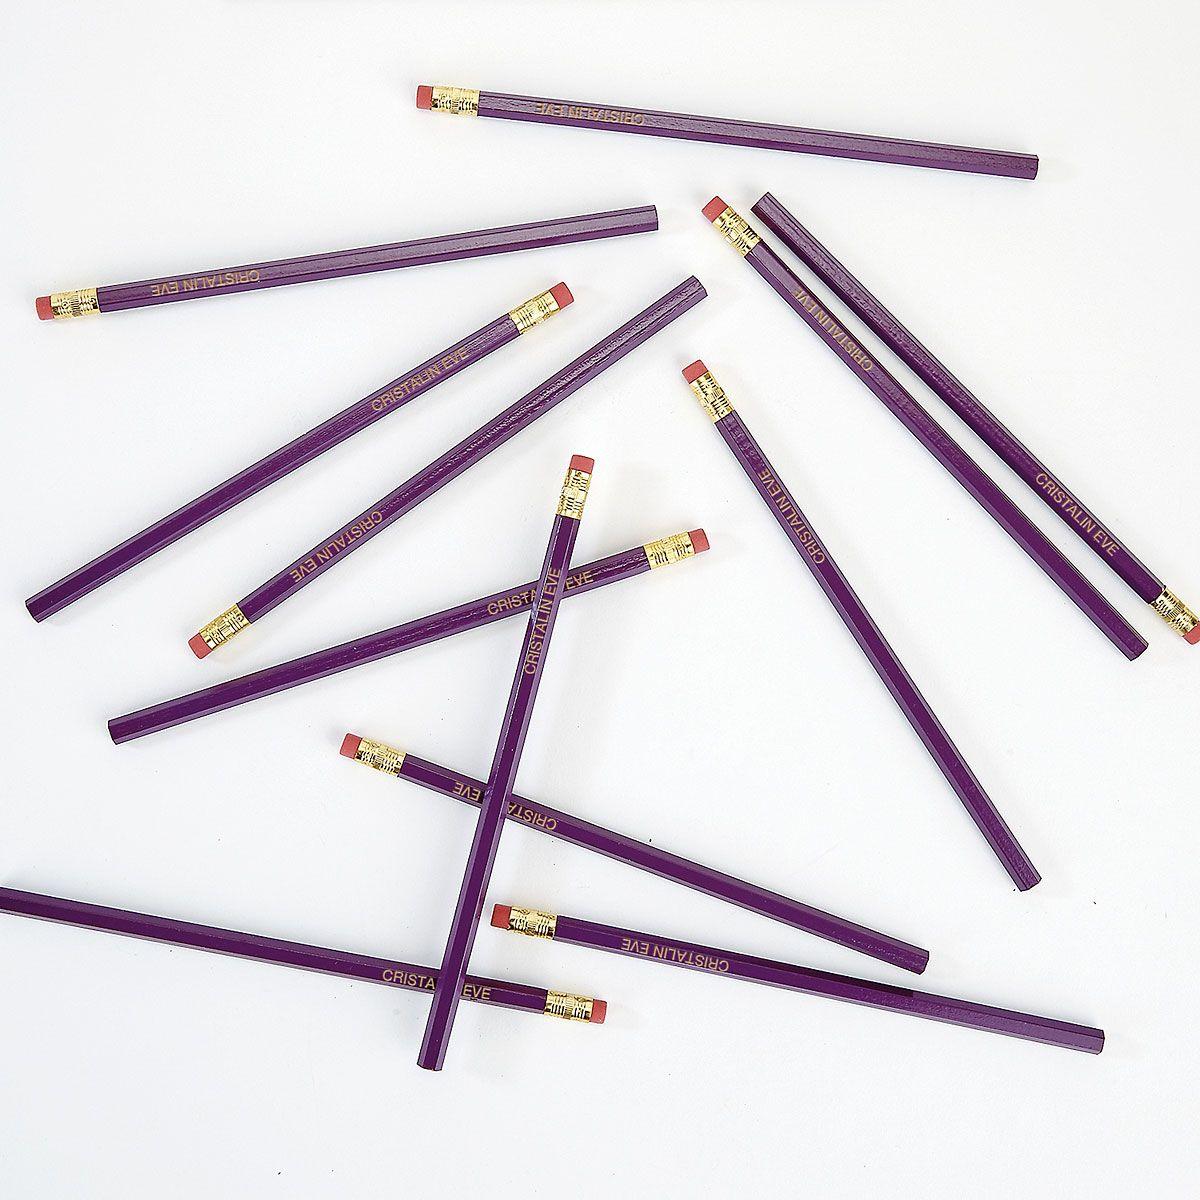 #2 Personalized Hardwood Pencils - Light Purple